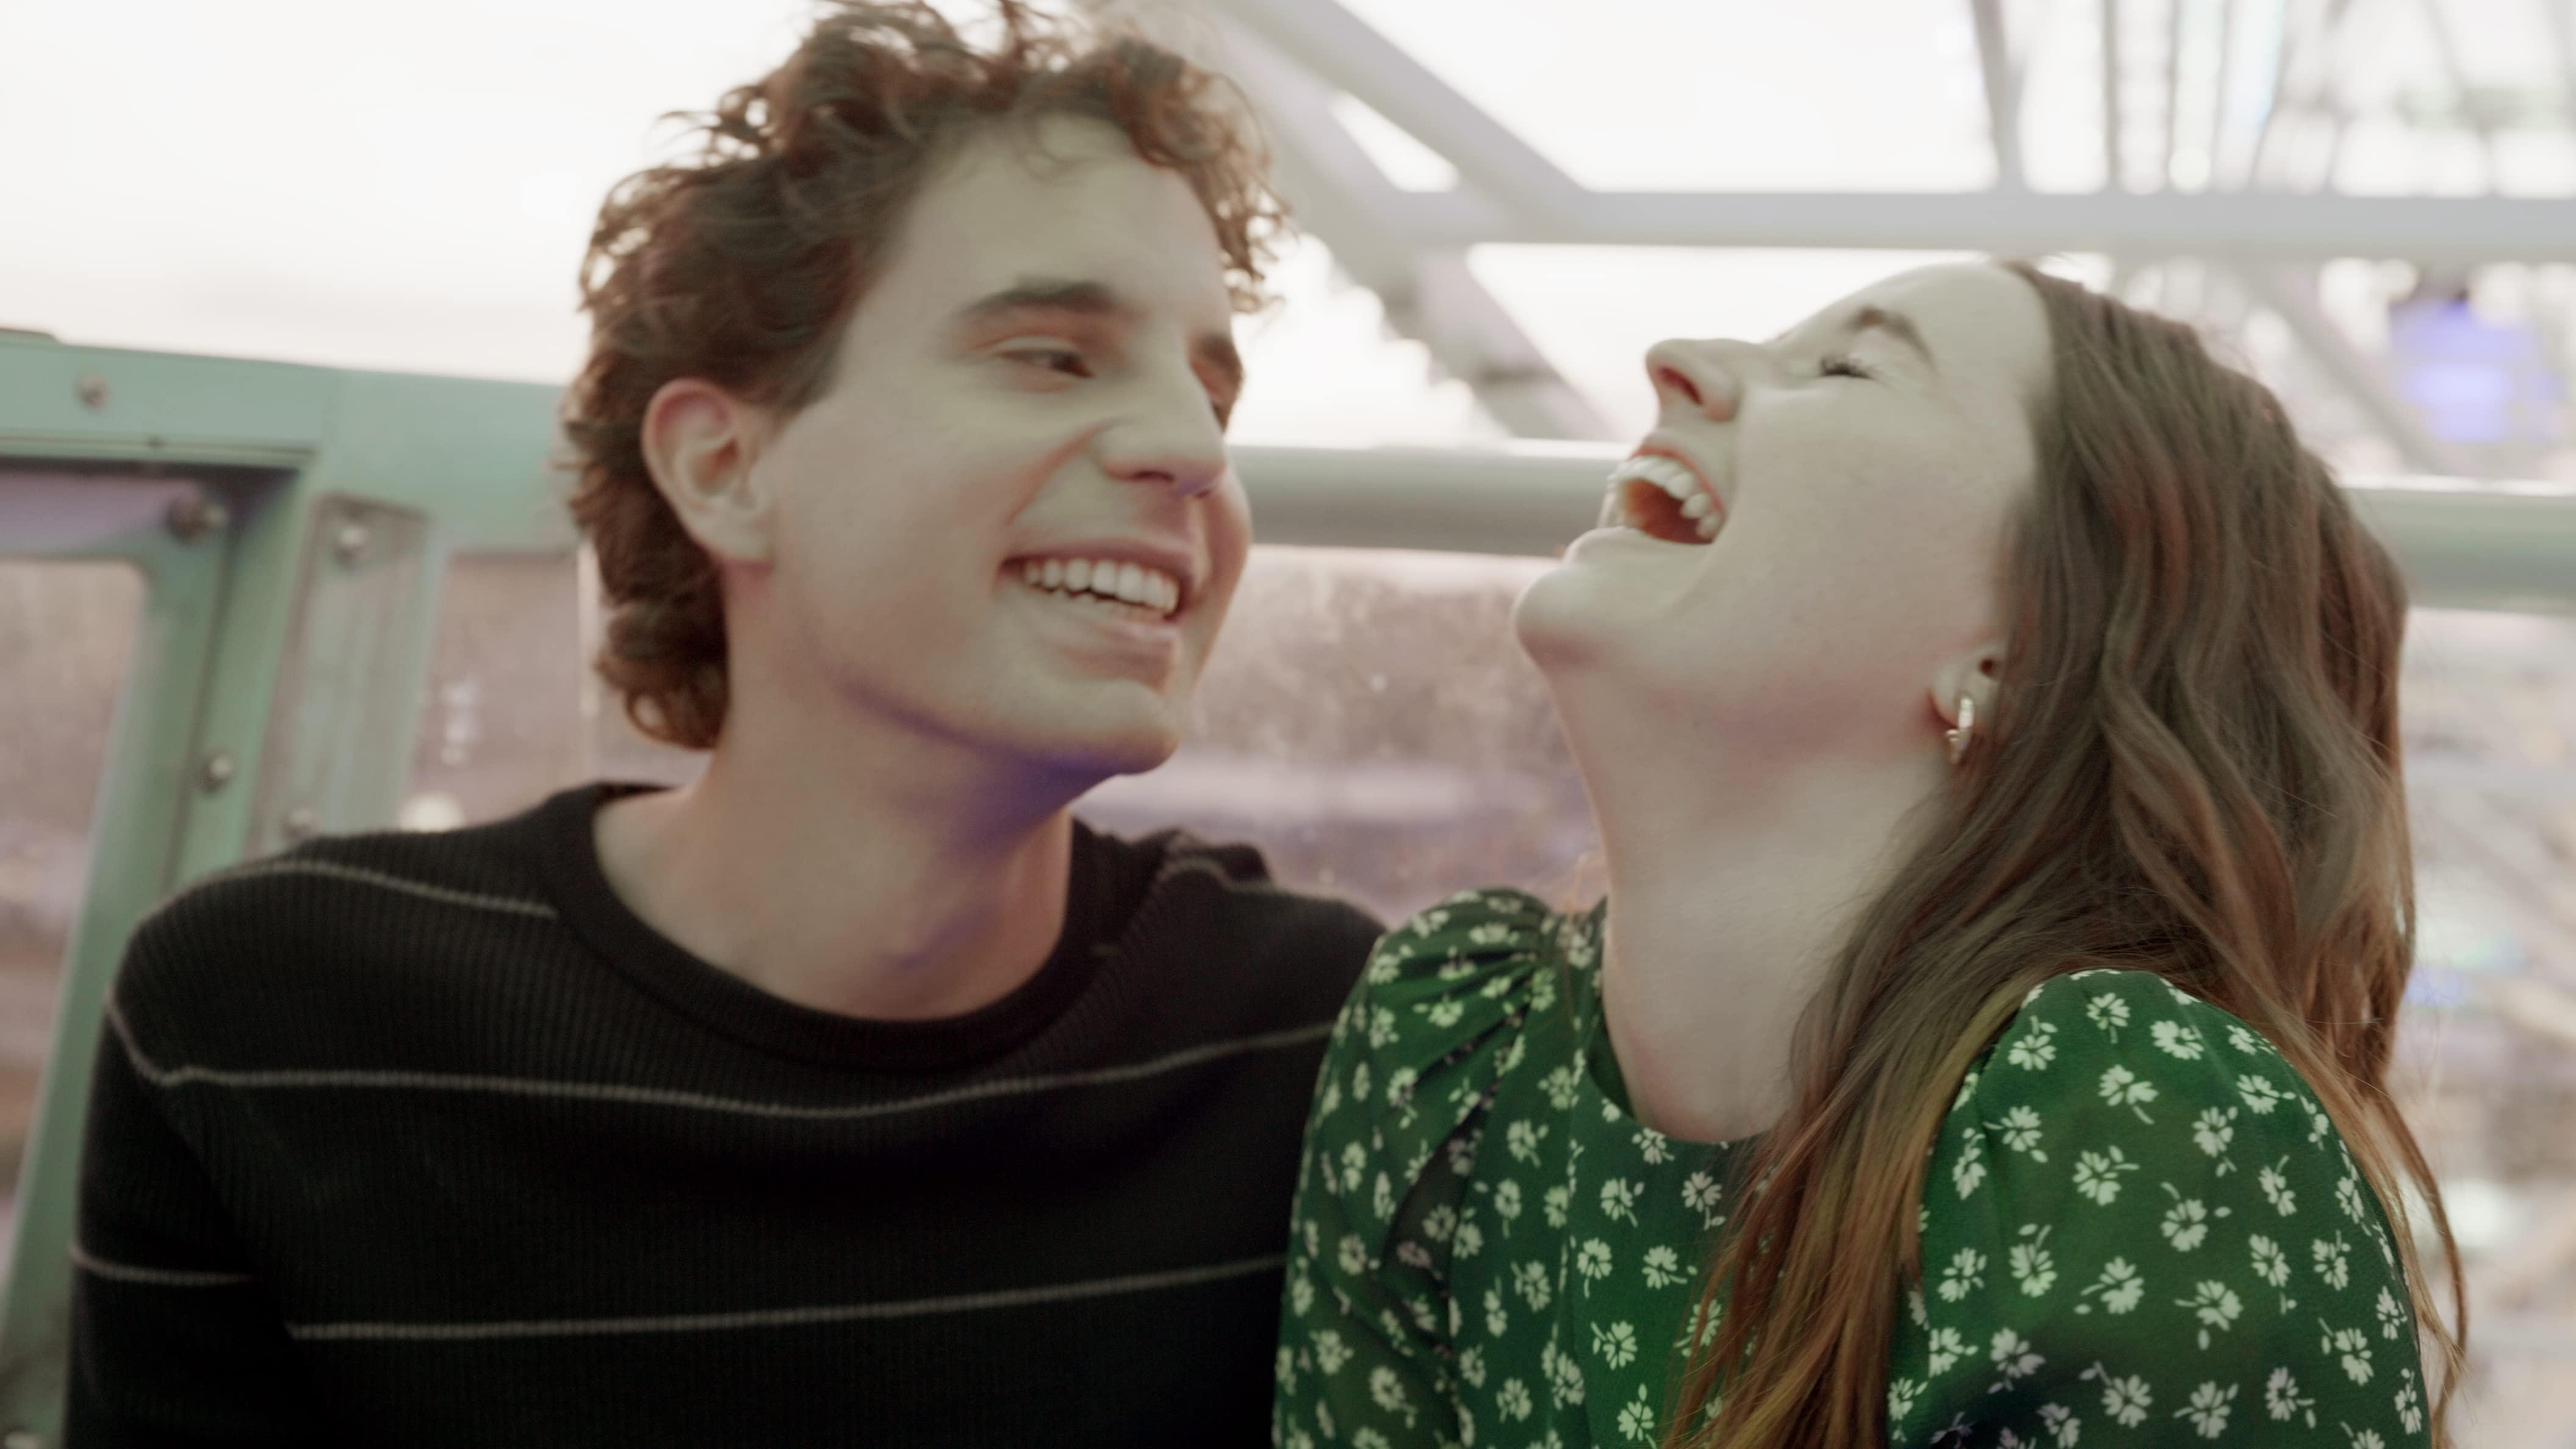 Dear Evan Hansen' review: Cloying teenage musical a massive misfire